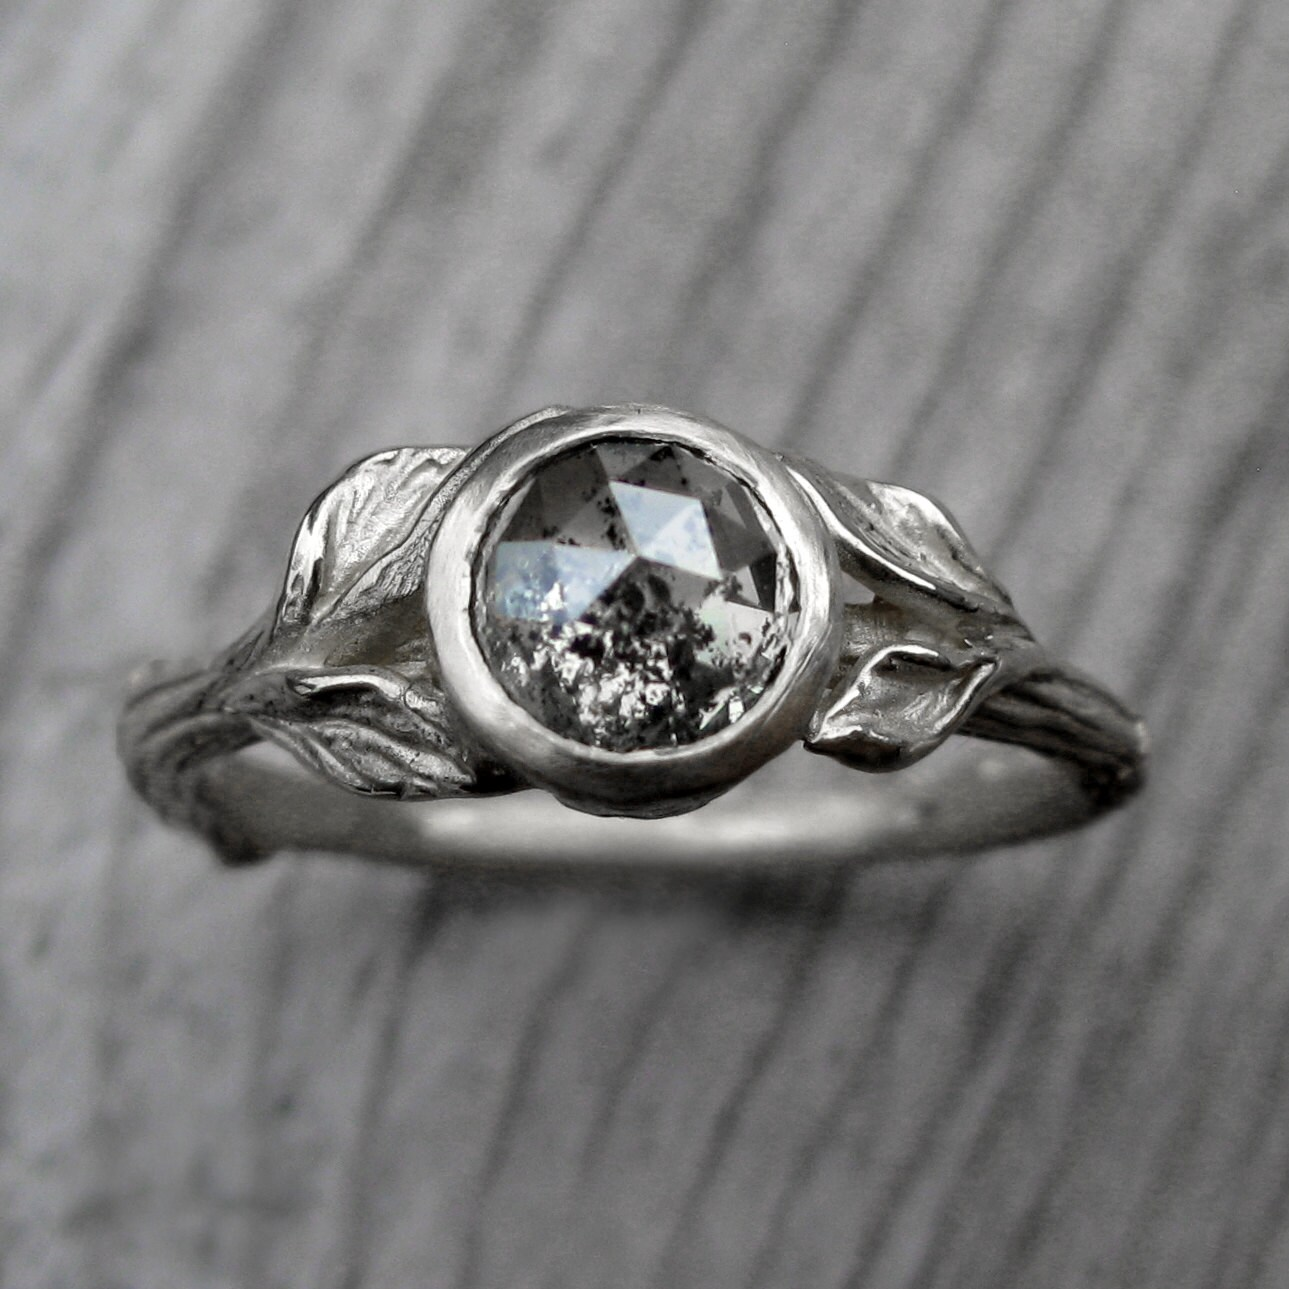 ... Rustic Diamond Ring. 🔎zoom